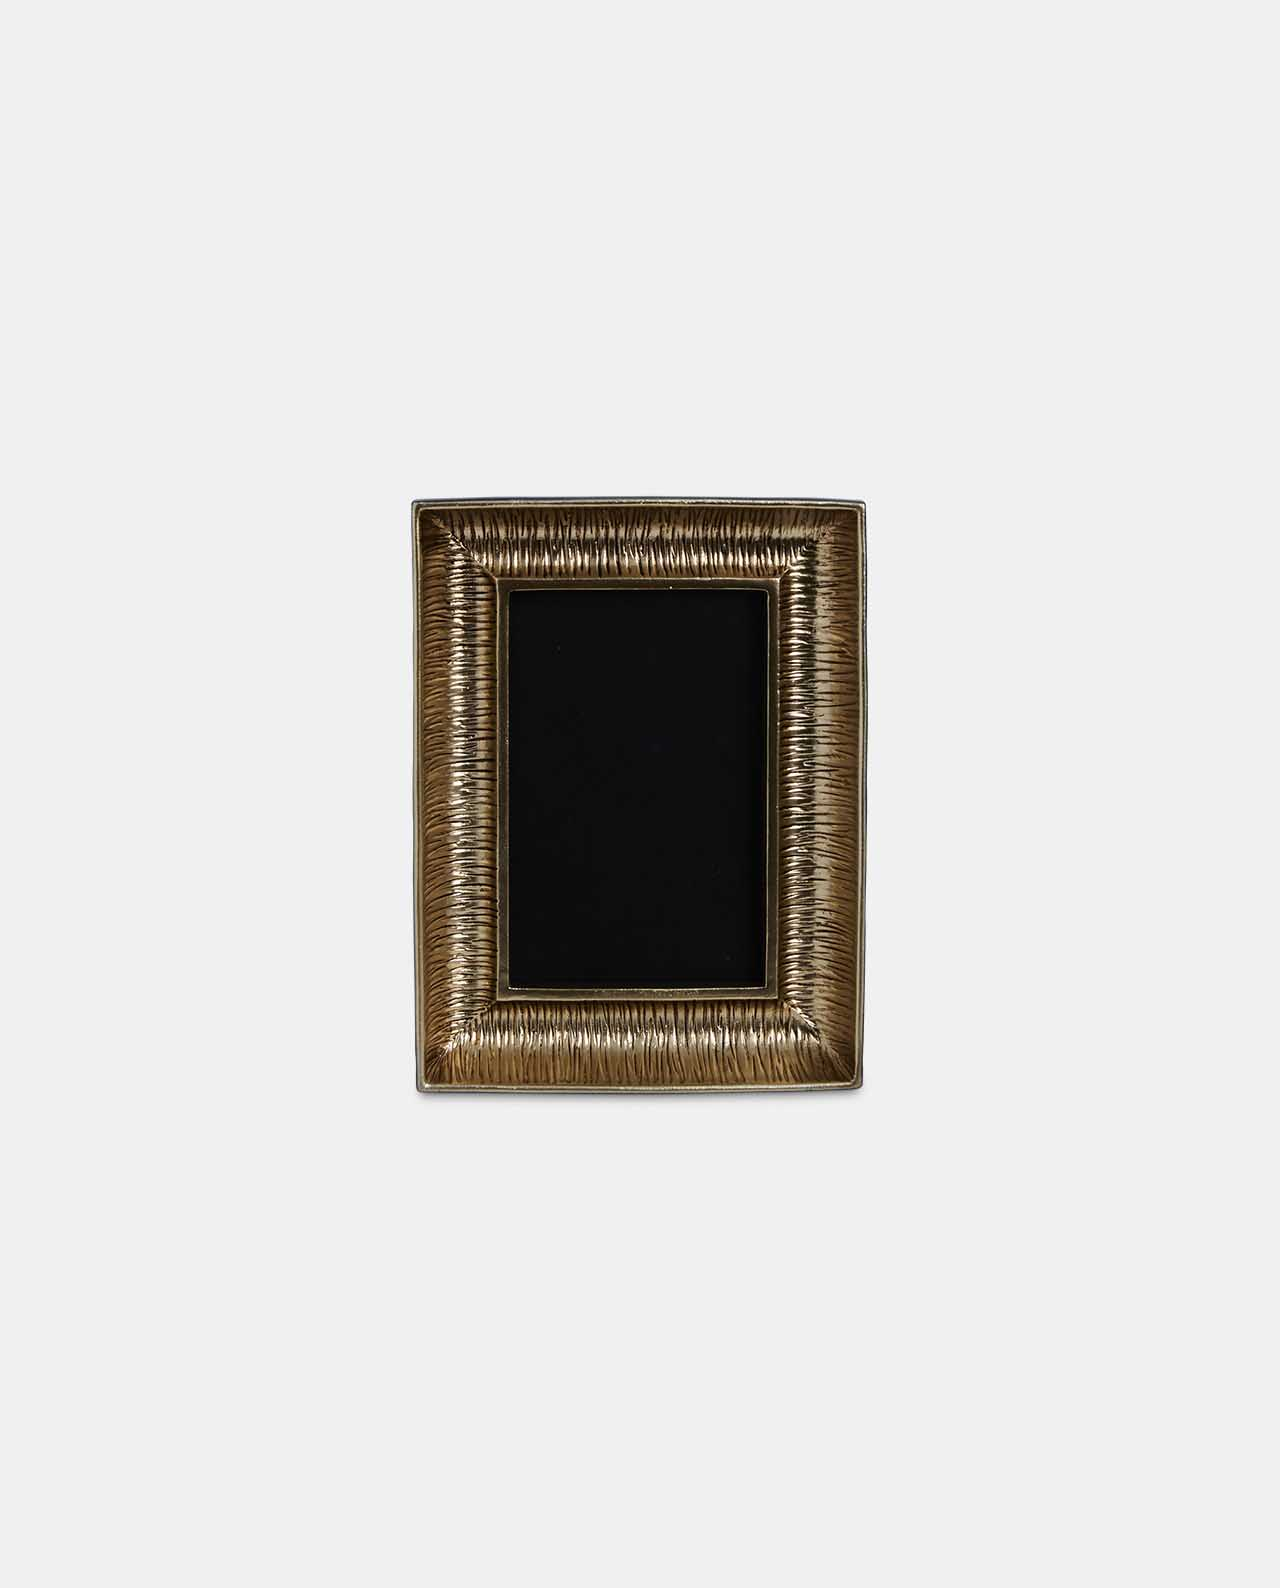 Small Gold Decorative Curve Photo Frame